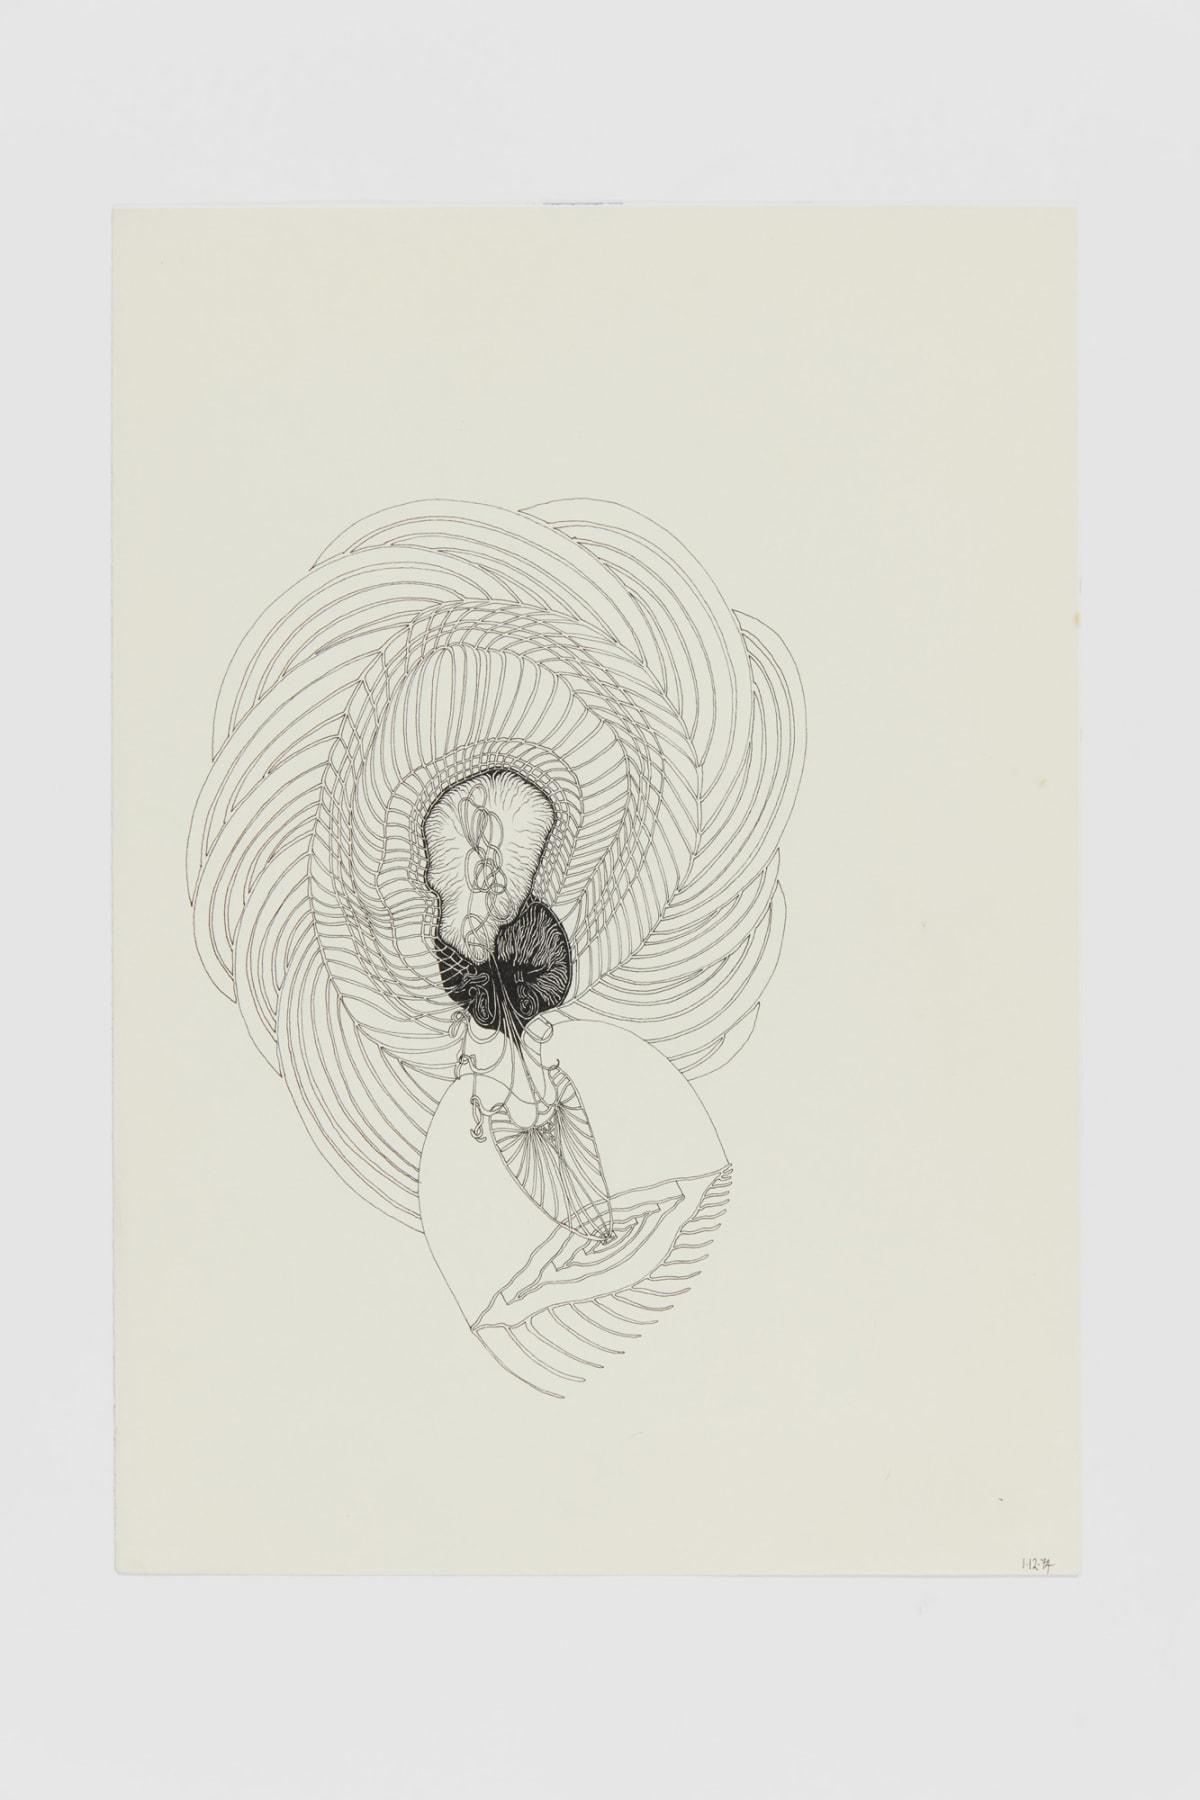 Ann CHURCHILL 1.12.74 (Daily drawings), 1974/75 Pen on paper 29.7 x 20.9 cm